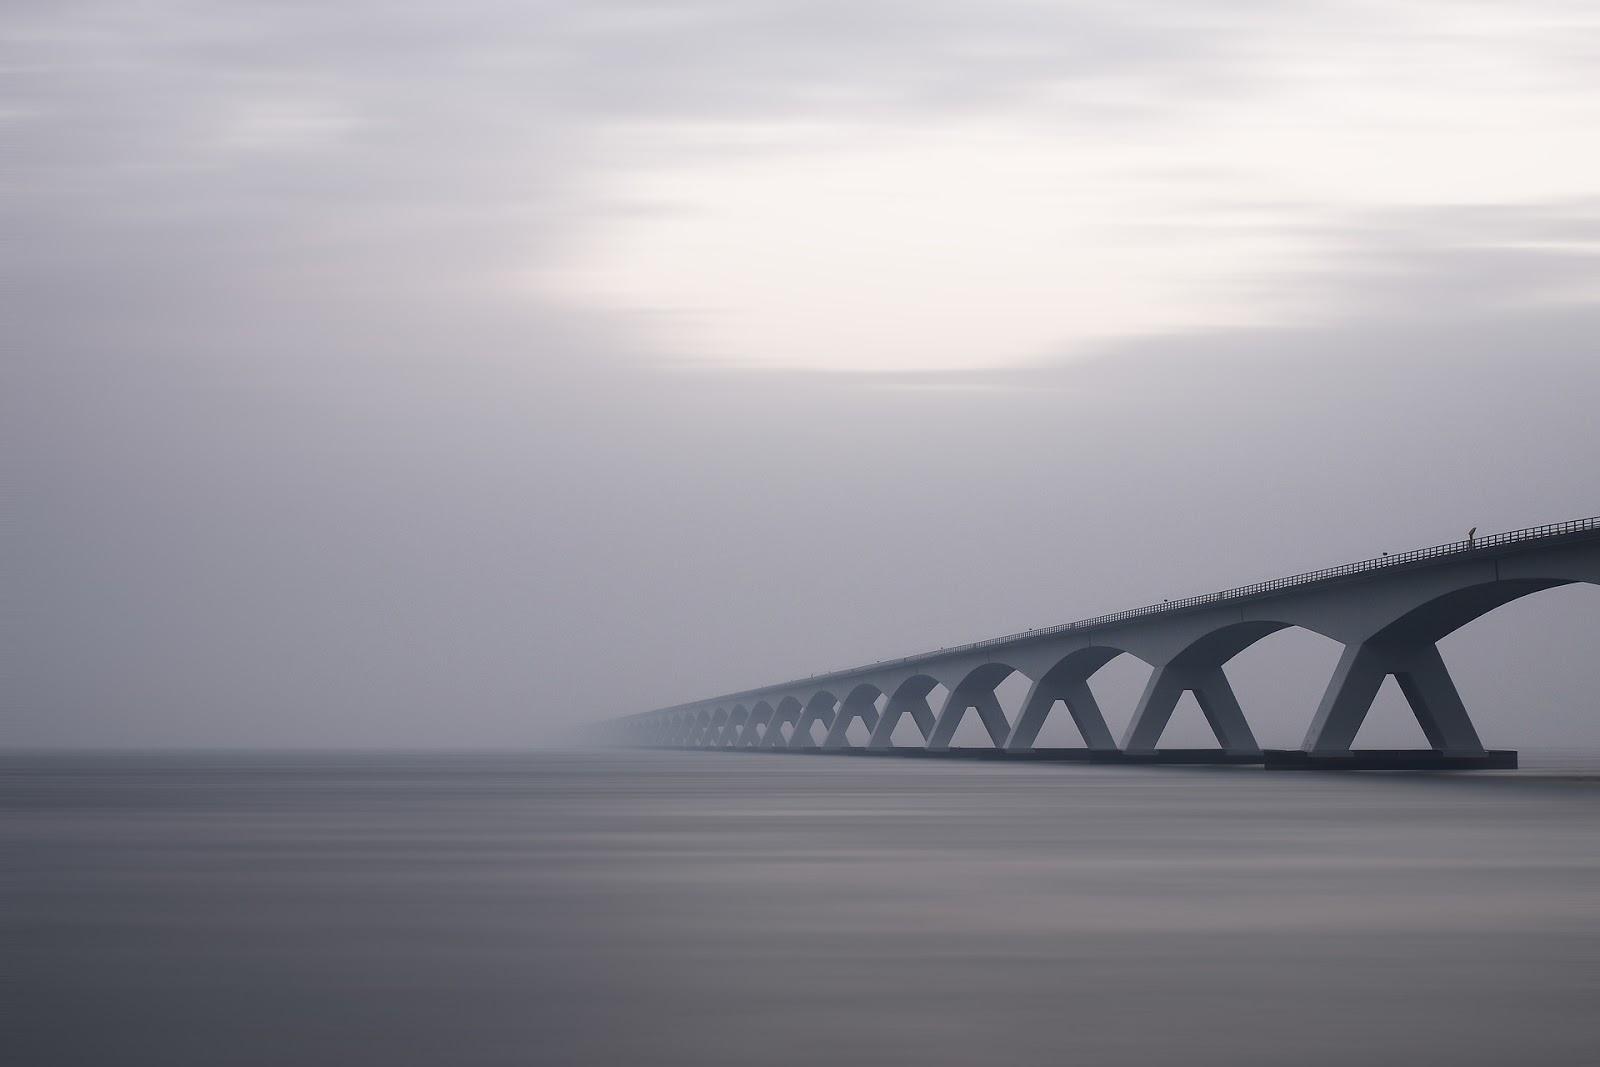 longest Bridge in the world